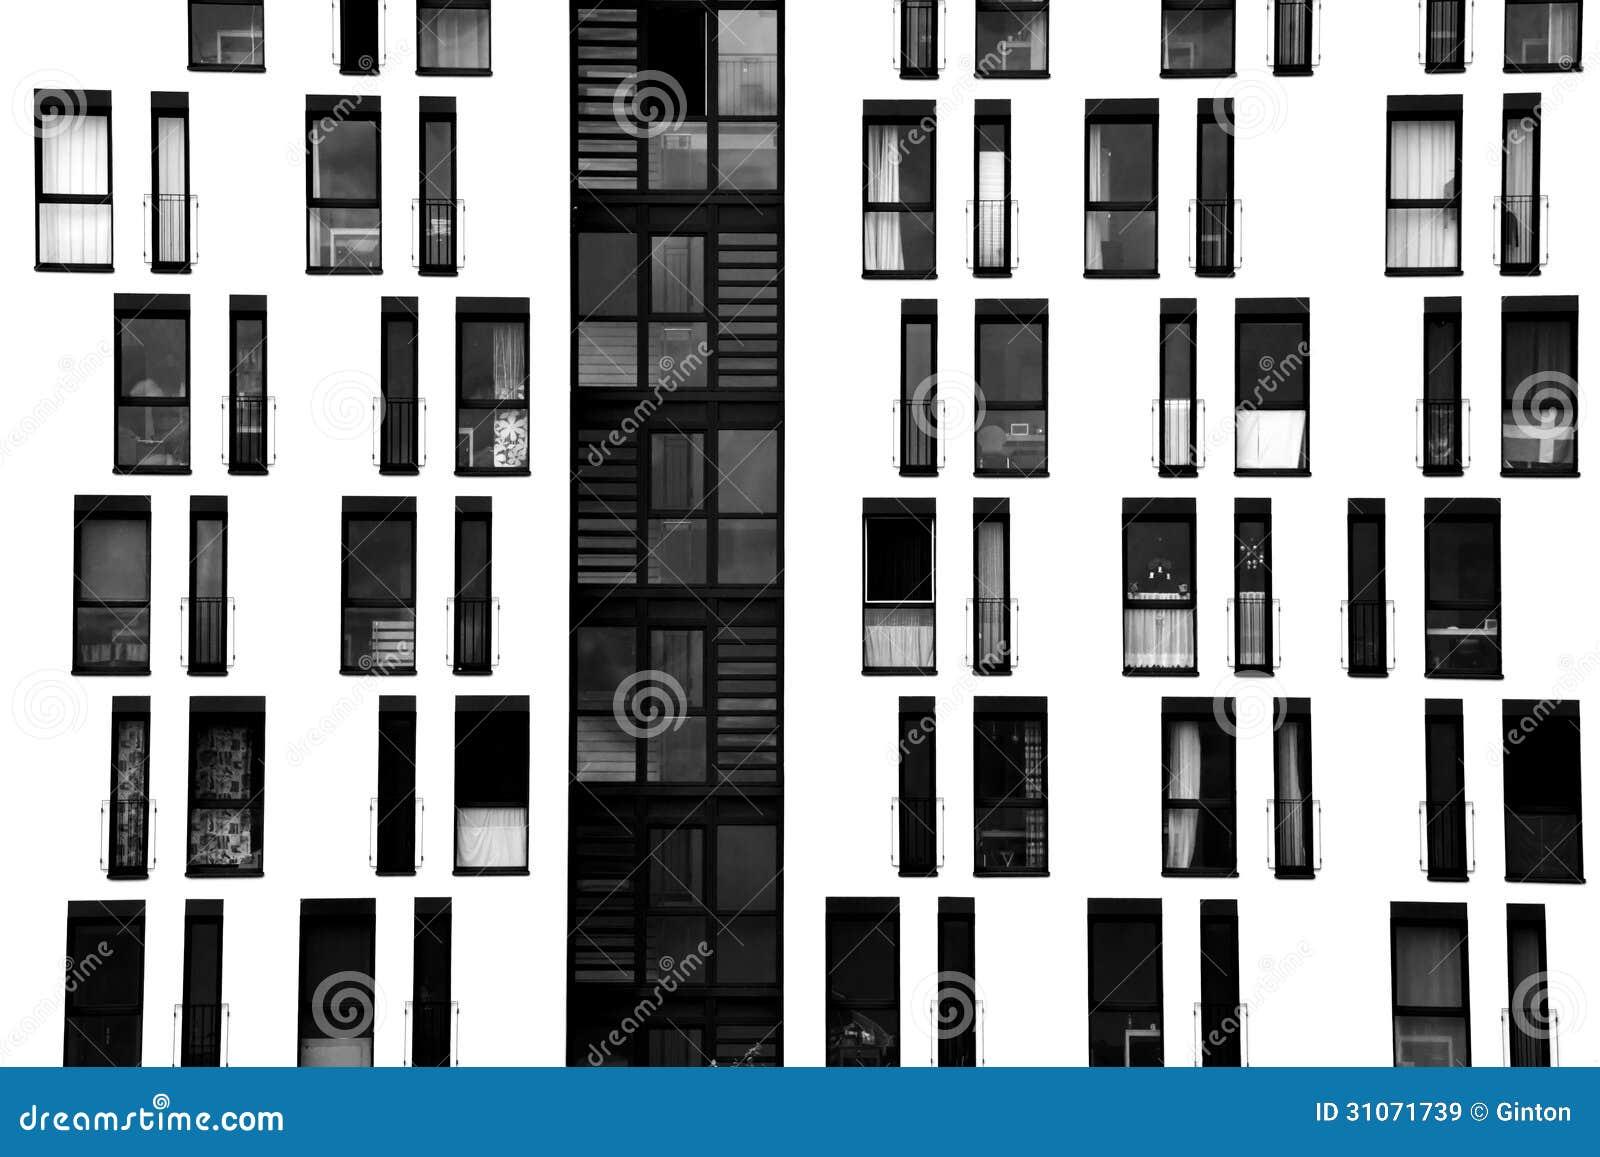 Window facade  Window Facade Royalty Free Stock Images - Image: 31071739